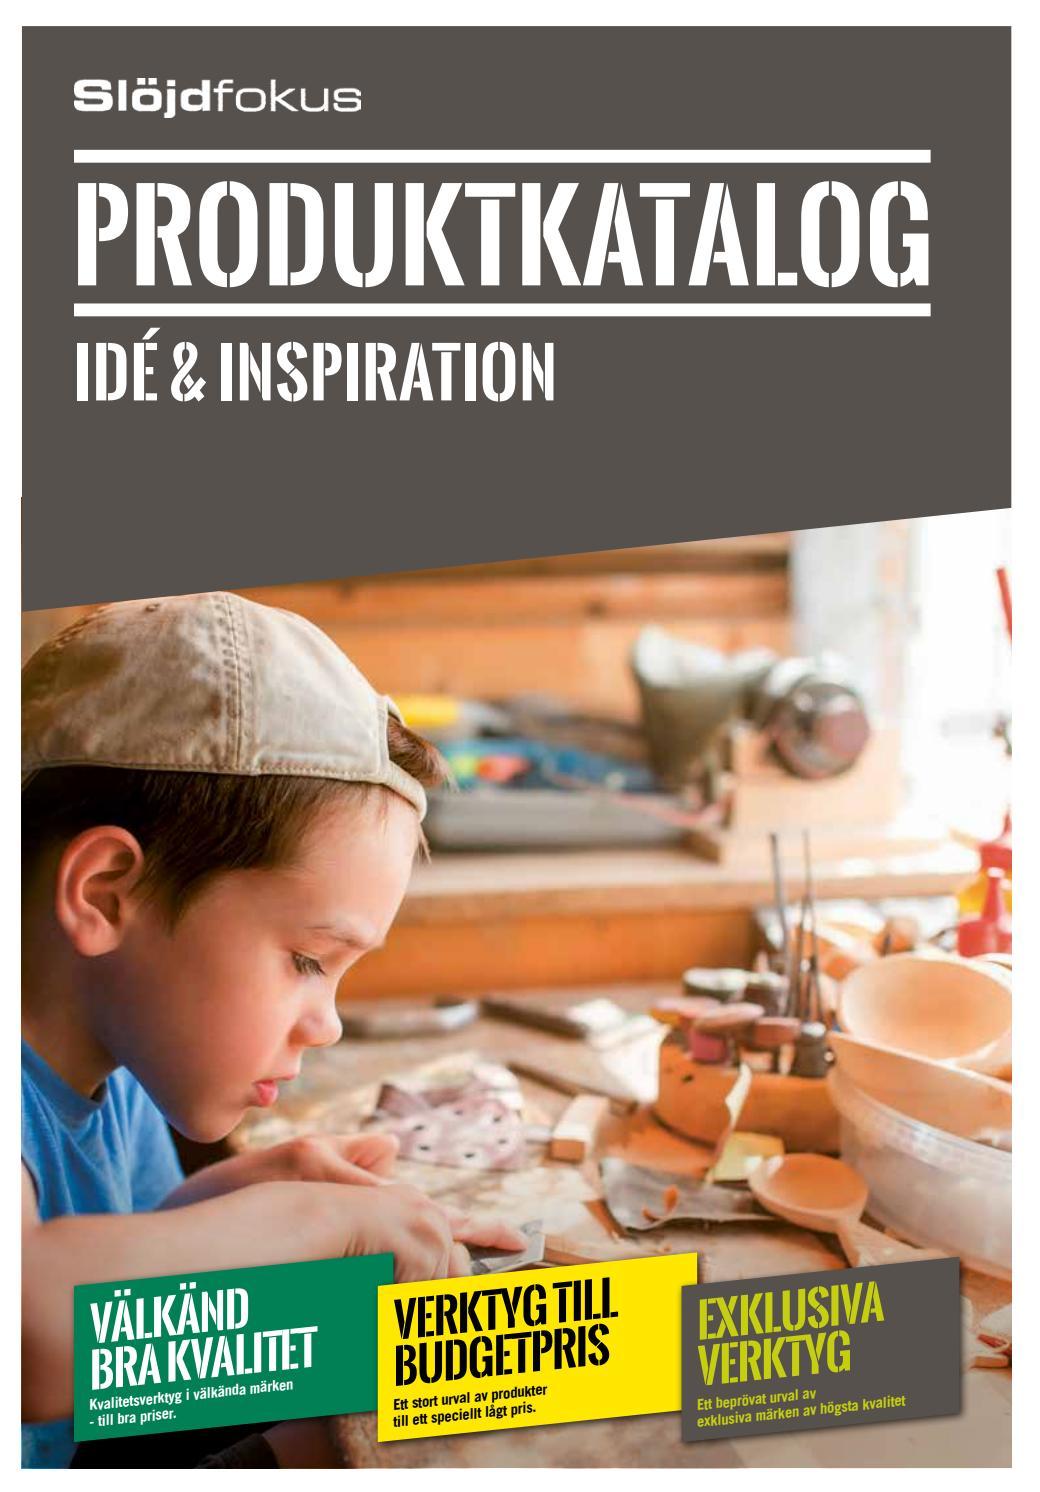 Slojdfokus.se - Produktkatalog 2017 by Linå A S - issuu daf6a57431692